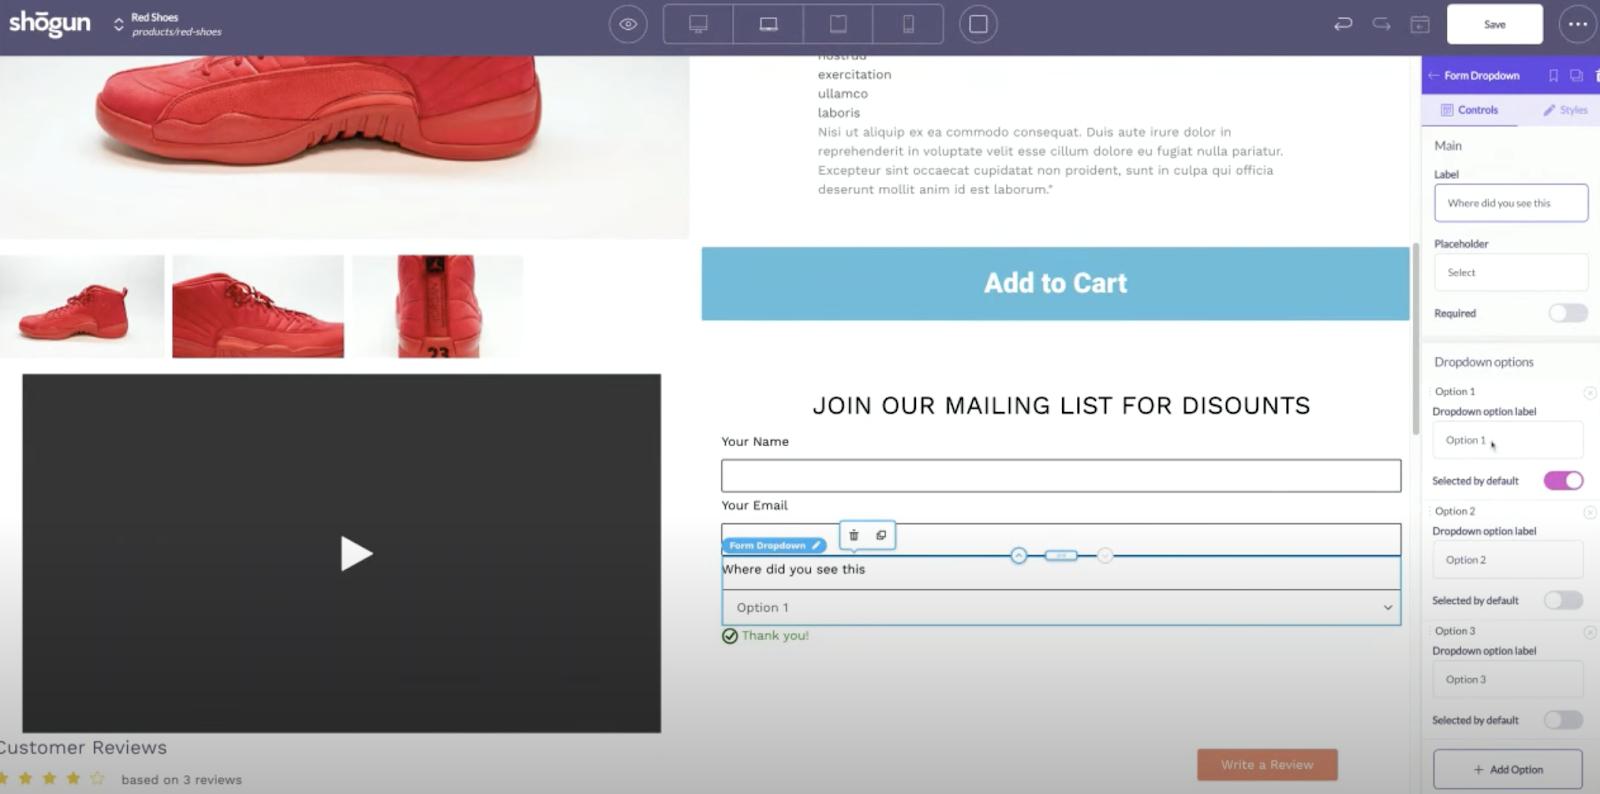 shogun page builder form element shopify store